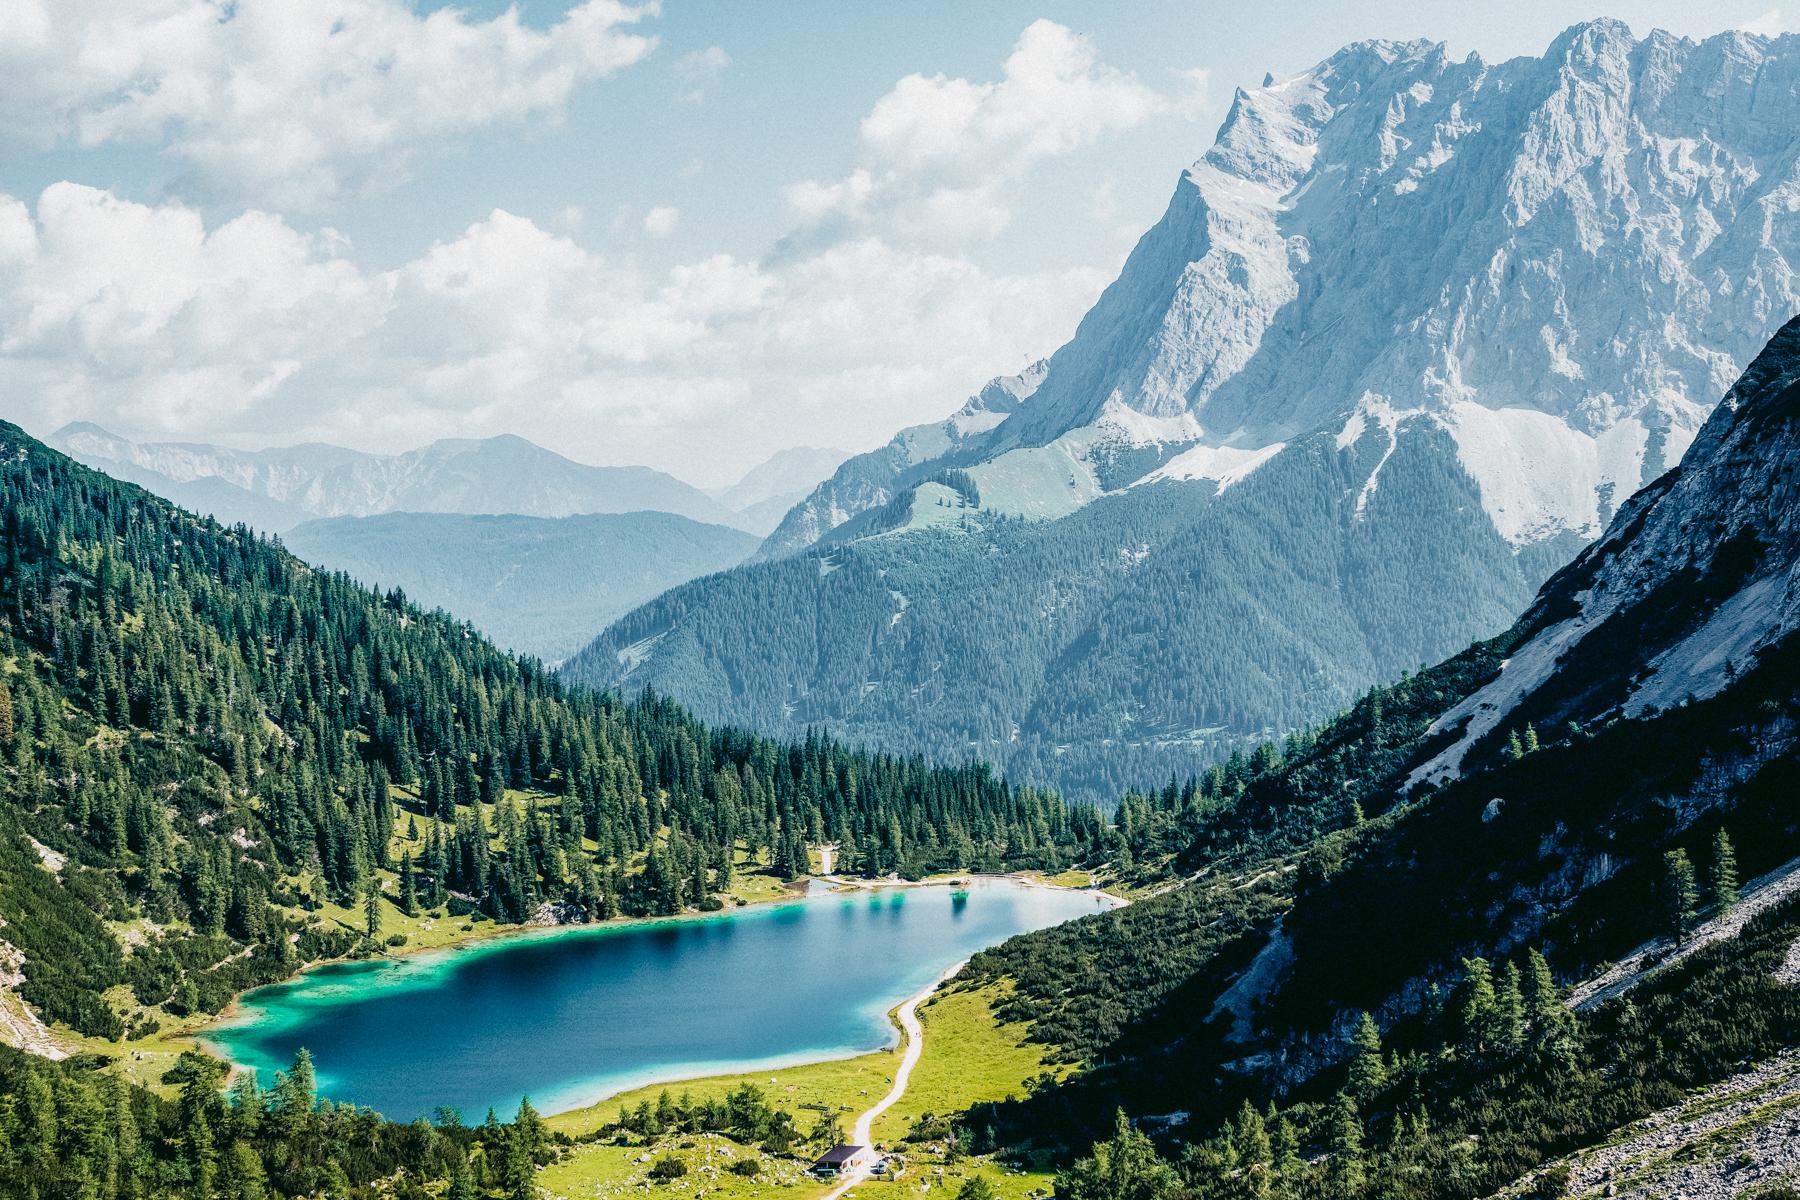 Geheimtipp Muenchen Indieberge Welloutside Drachenkopf 11 – ©Well Outside